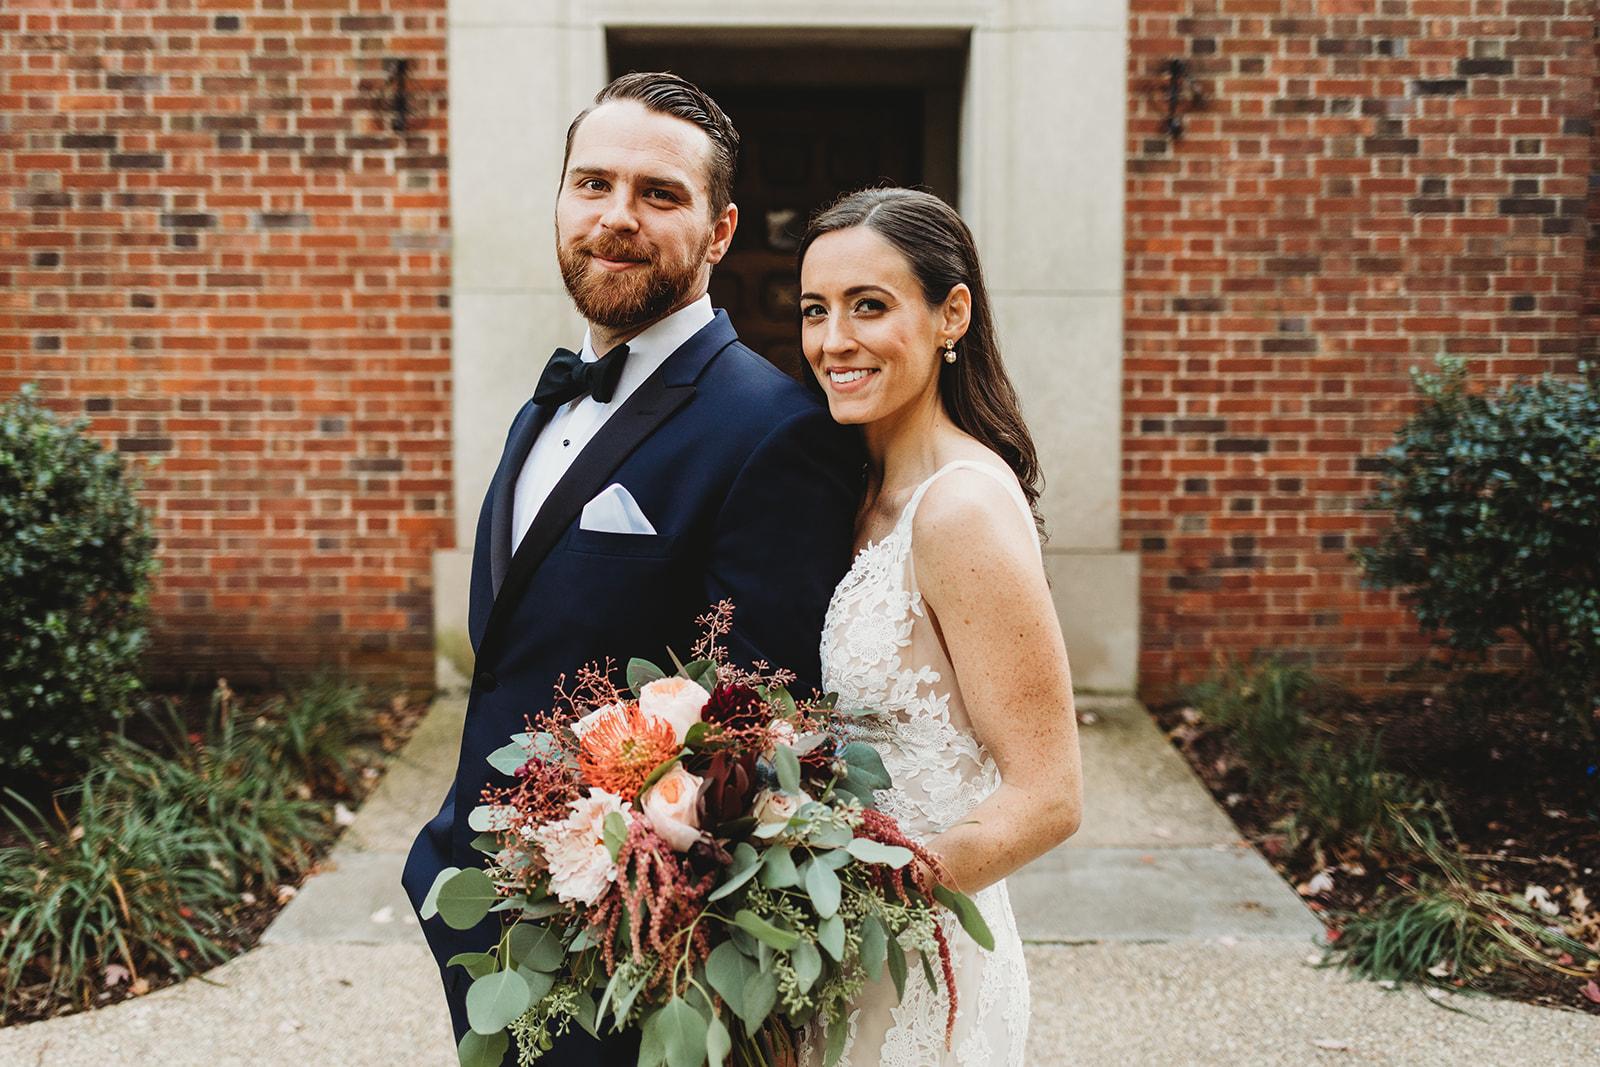 Ryan-Zarichnak-Photography-Pittsburgh-Susan-Evan-Wedding-1516.jpg